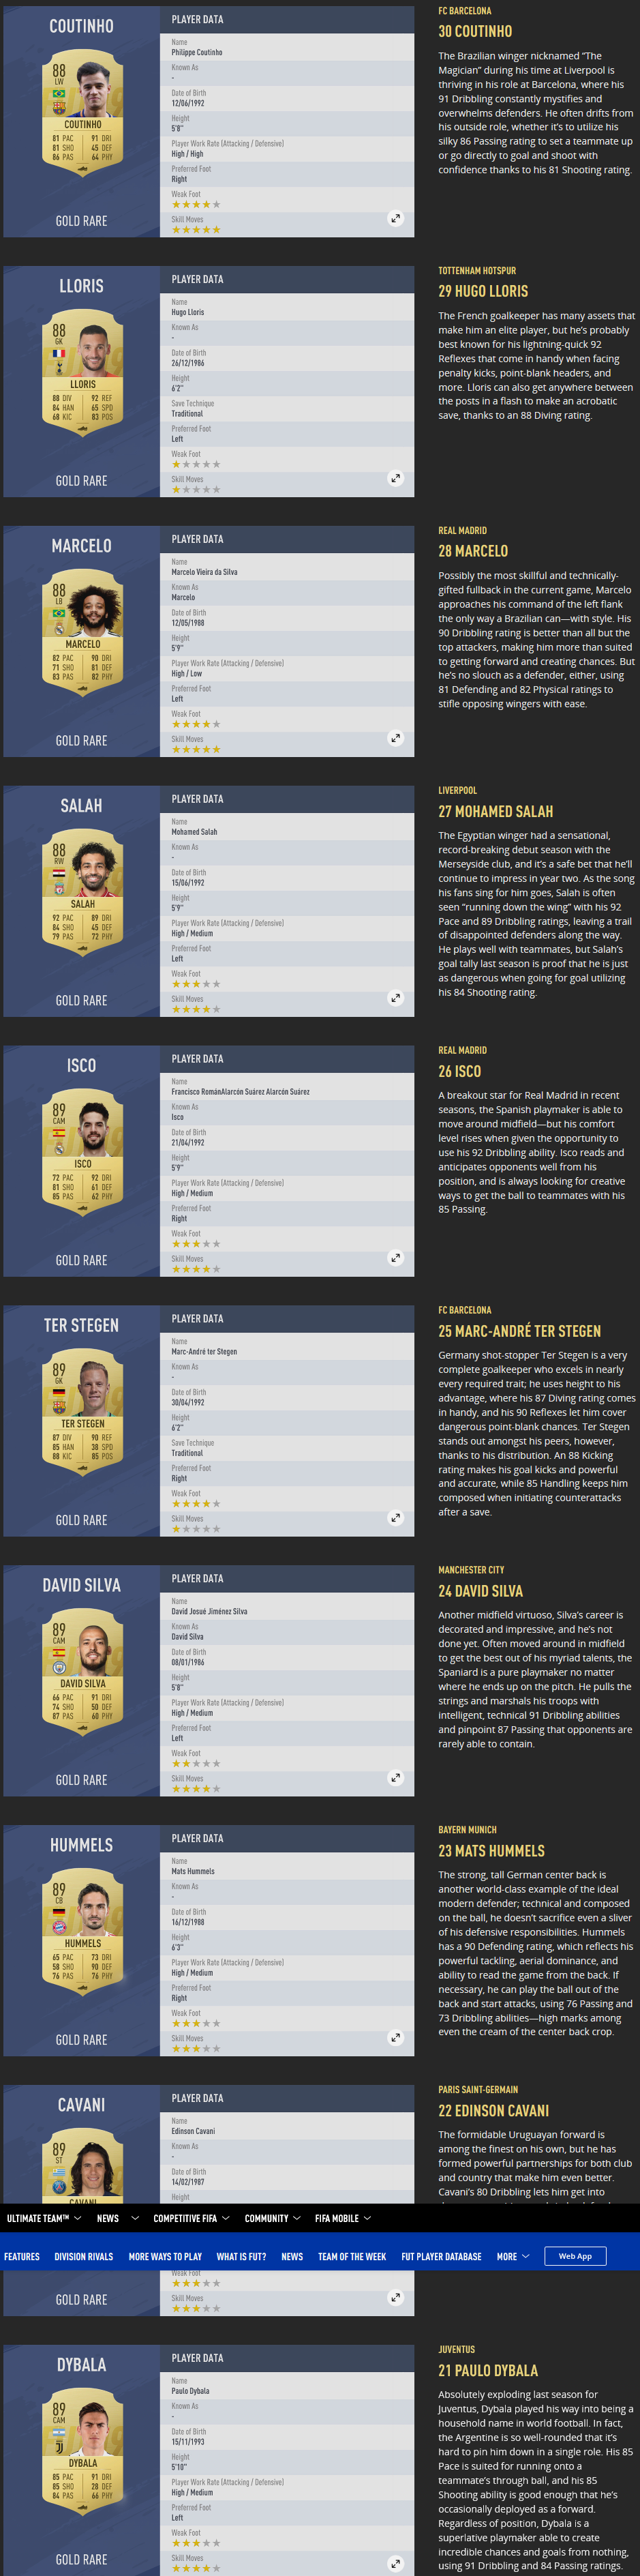 FIFA19PlayerRatingsTop100_21-30